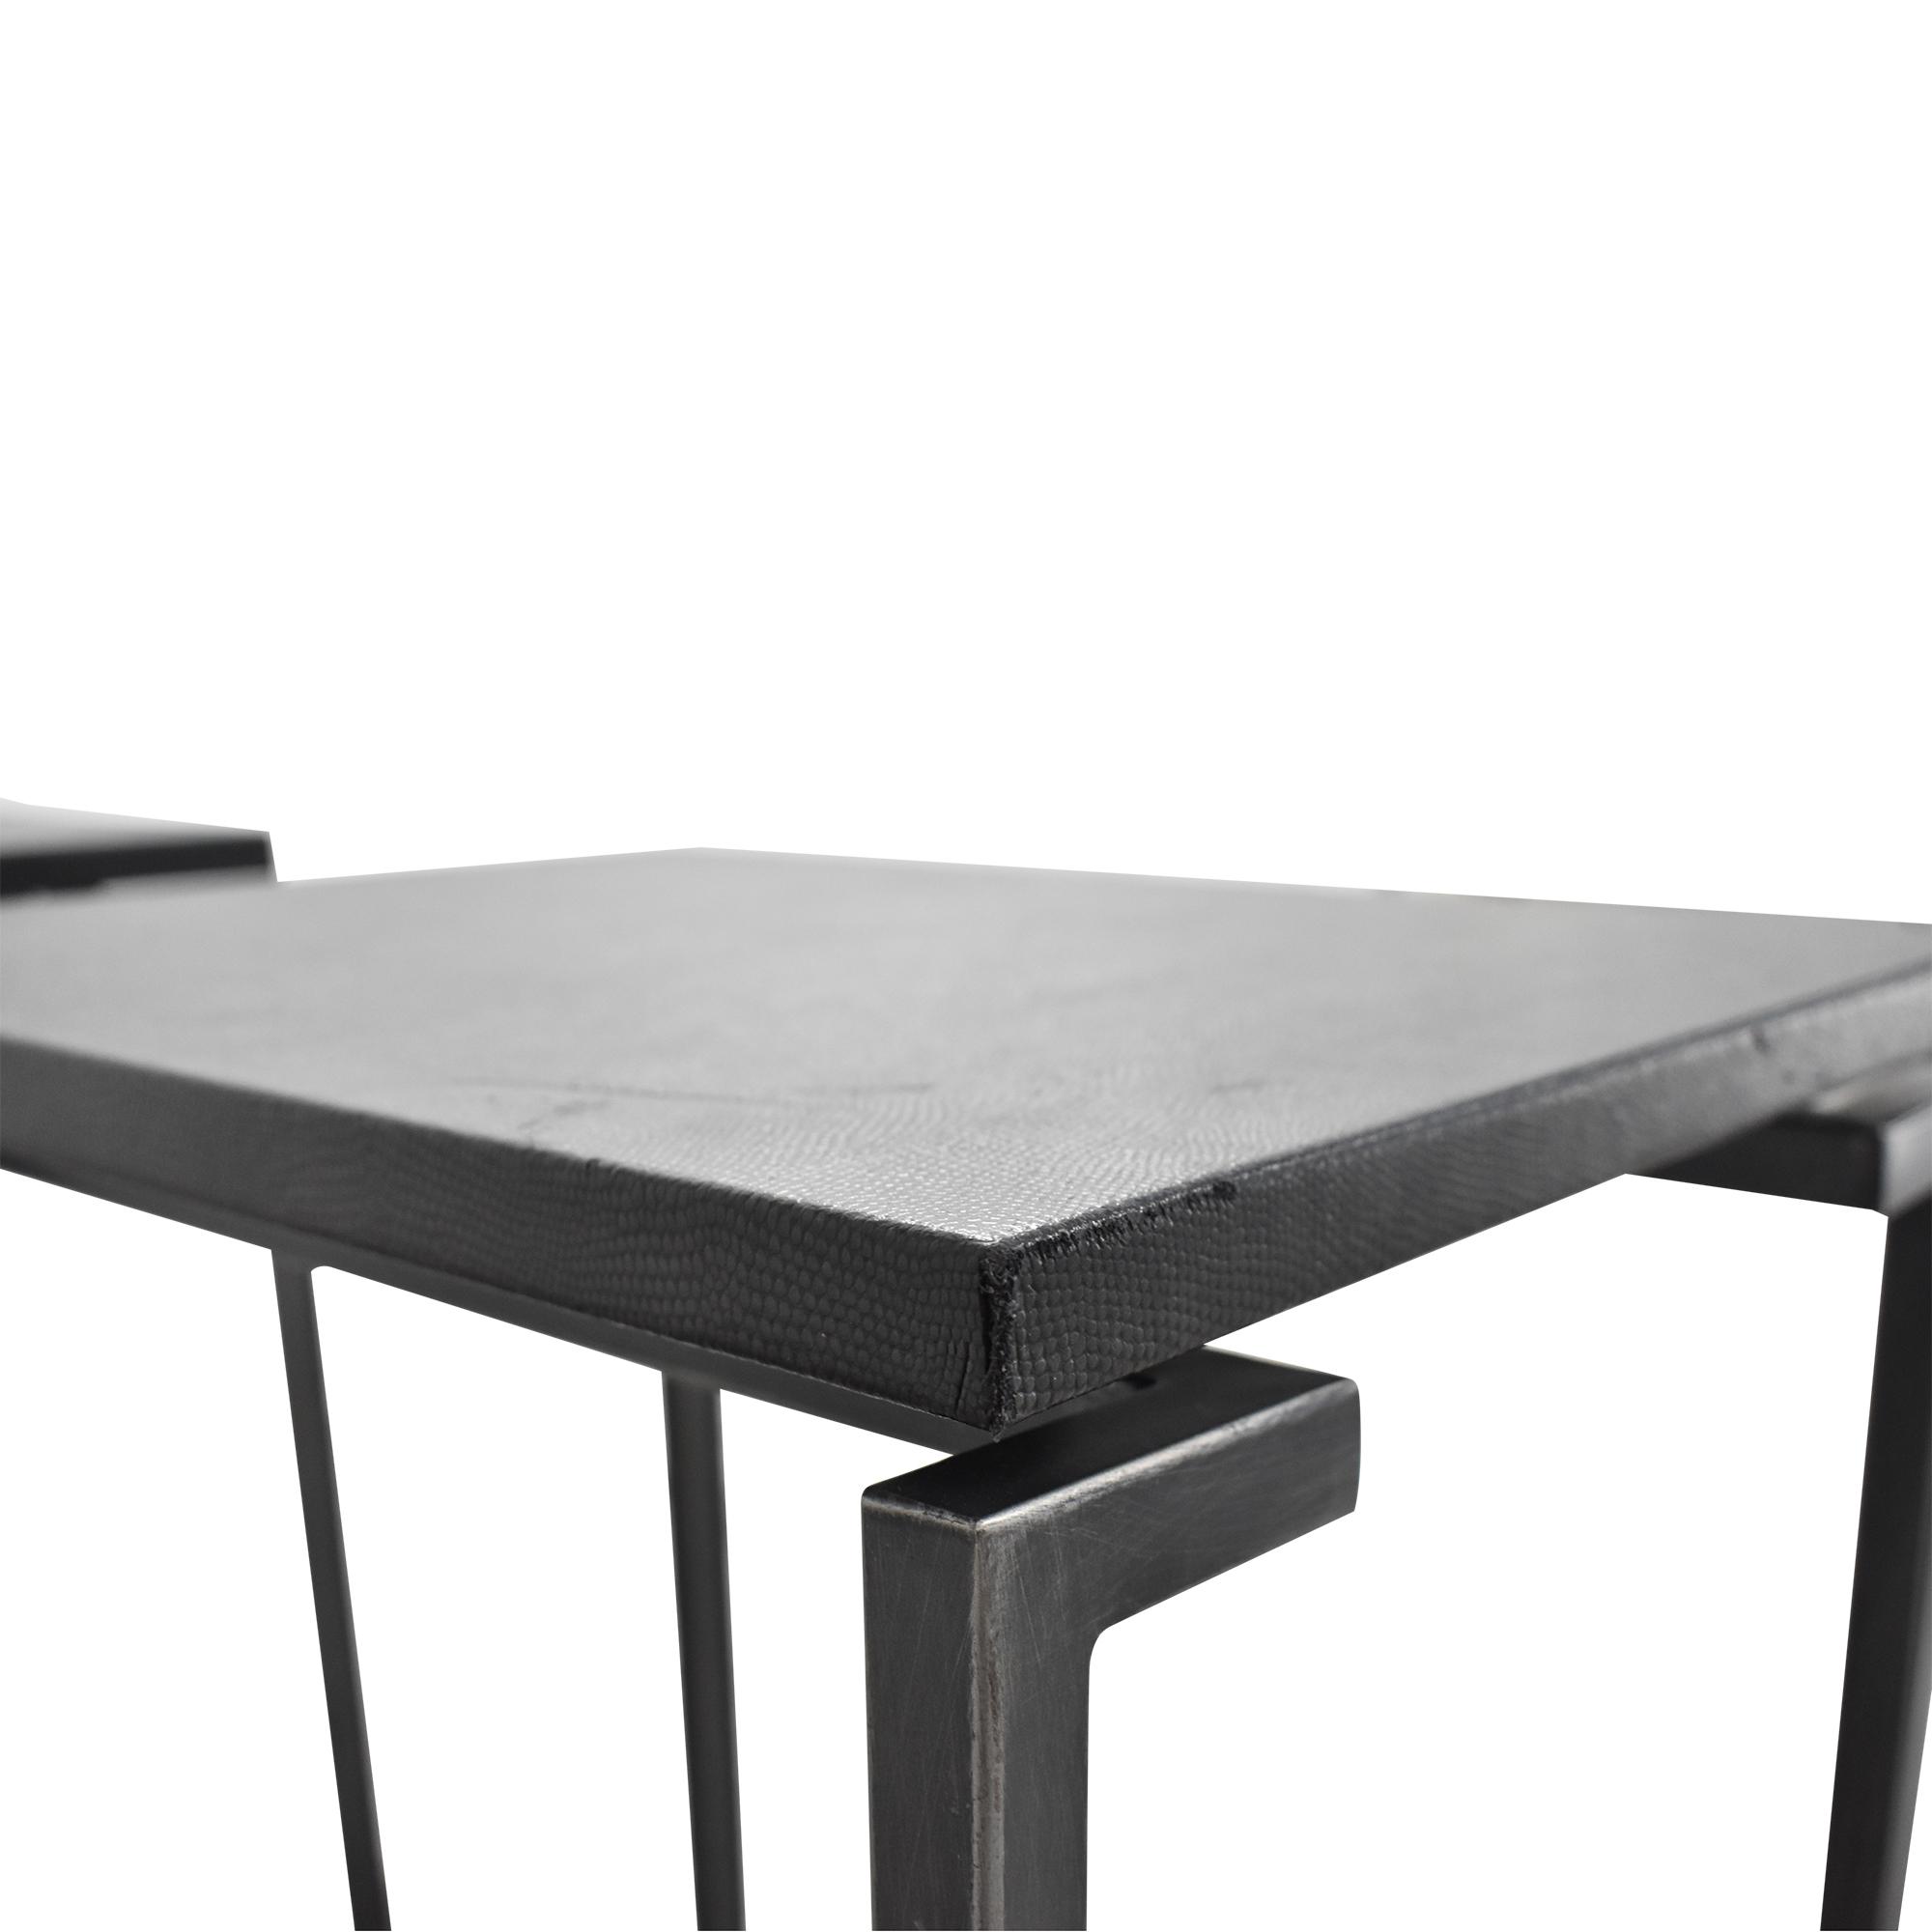 West Elm West Elm Modern End Tables nj